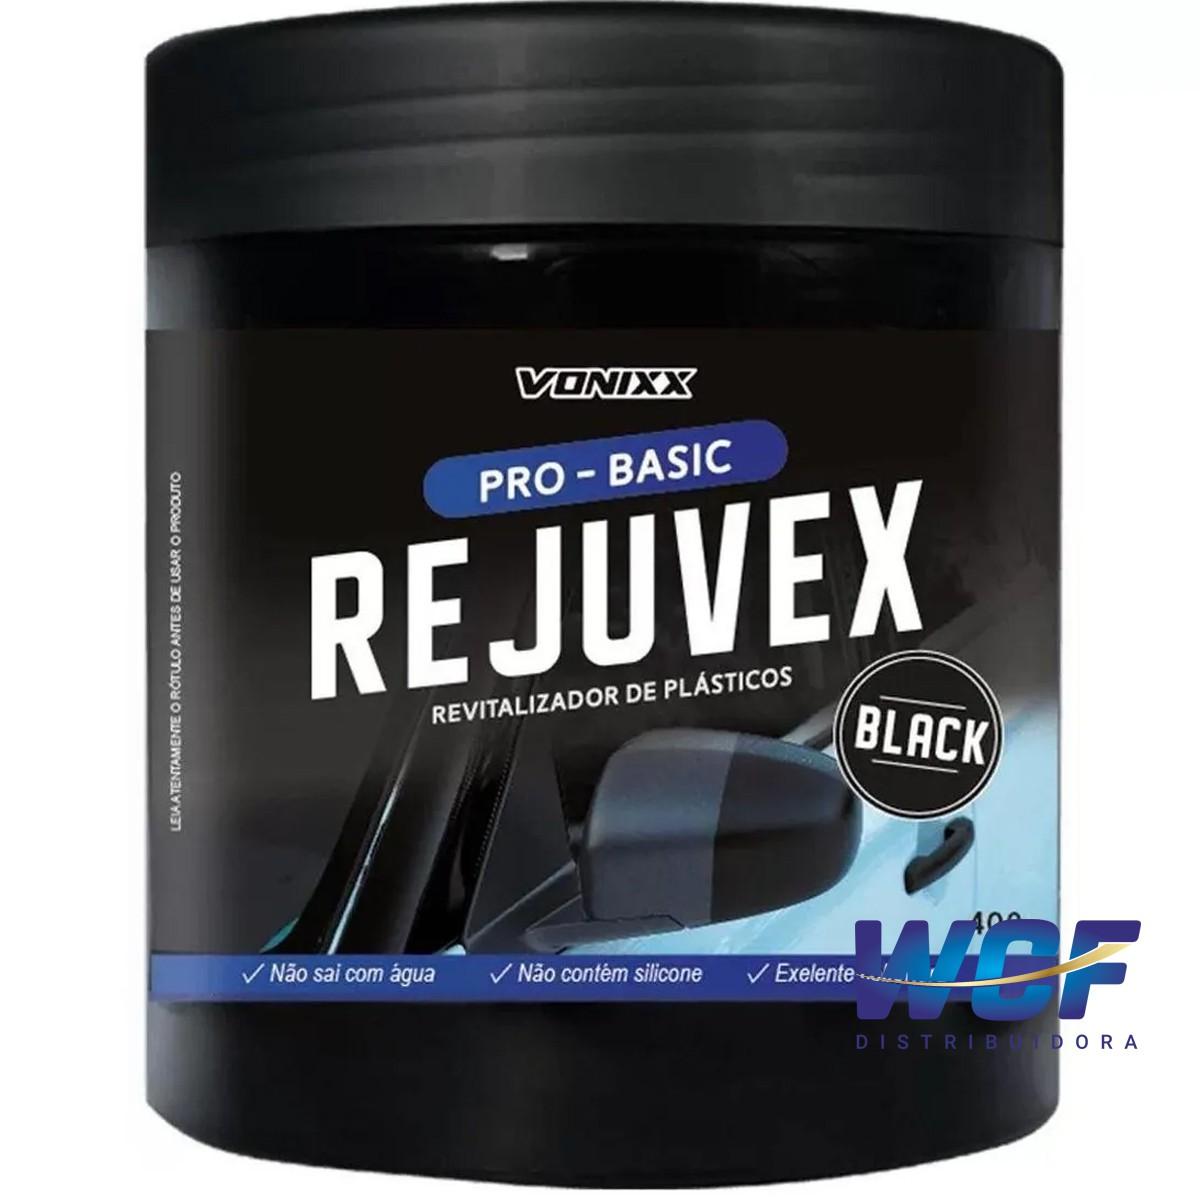 VONIXX REJUVEX 400 G BLACK